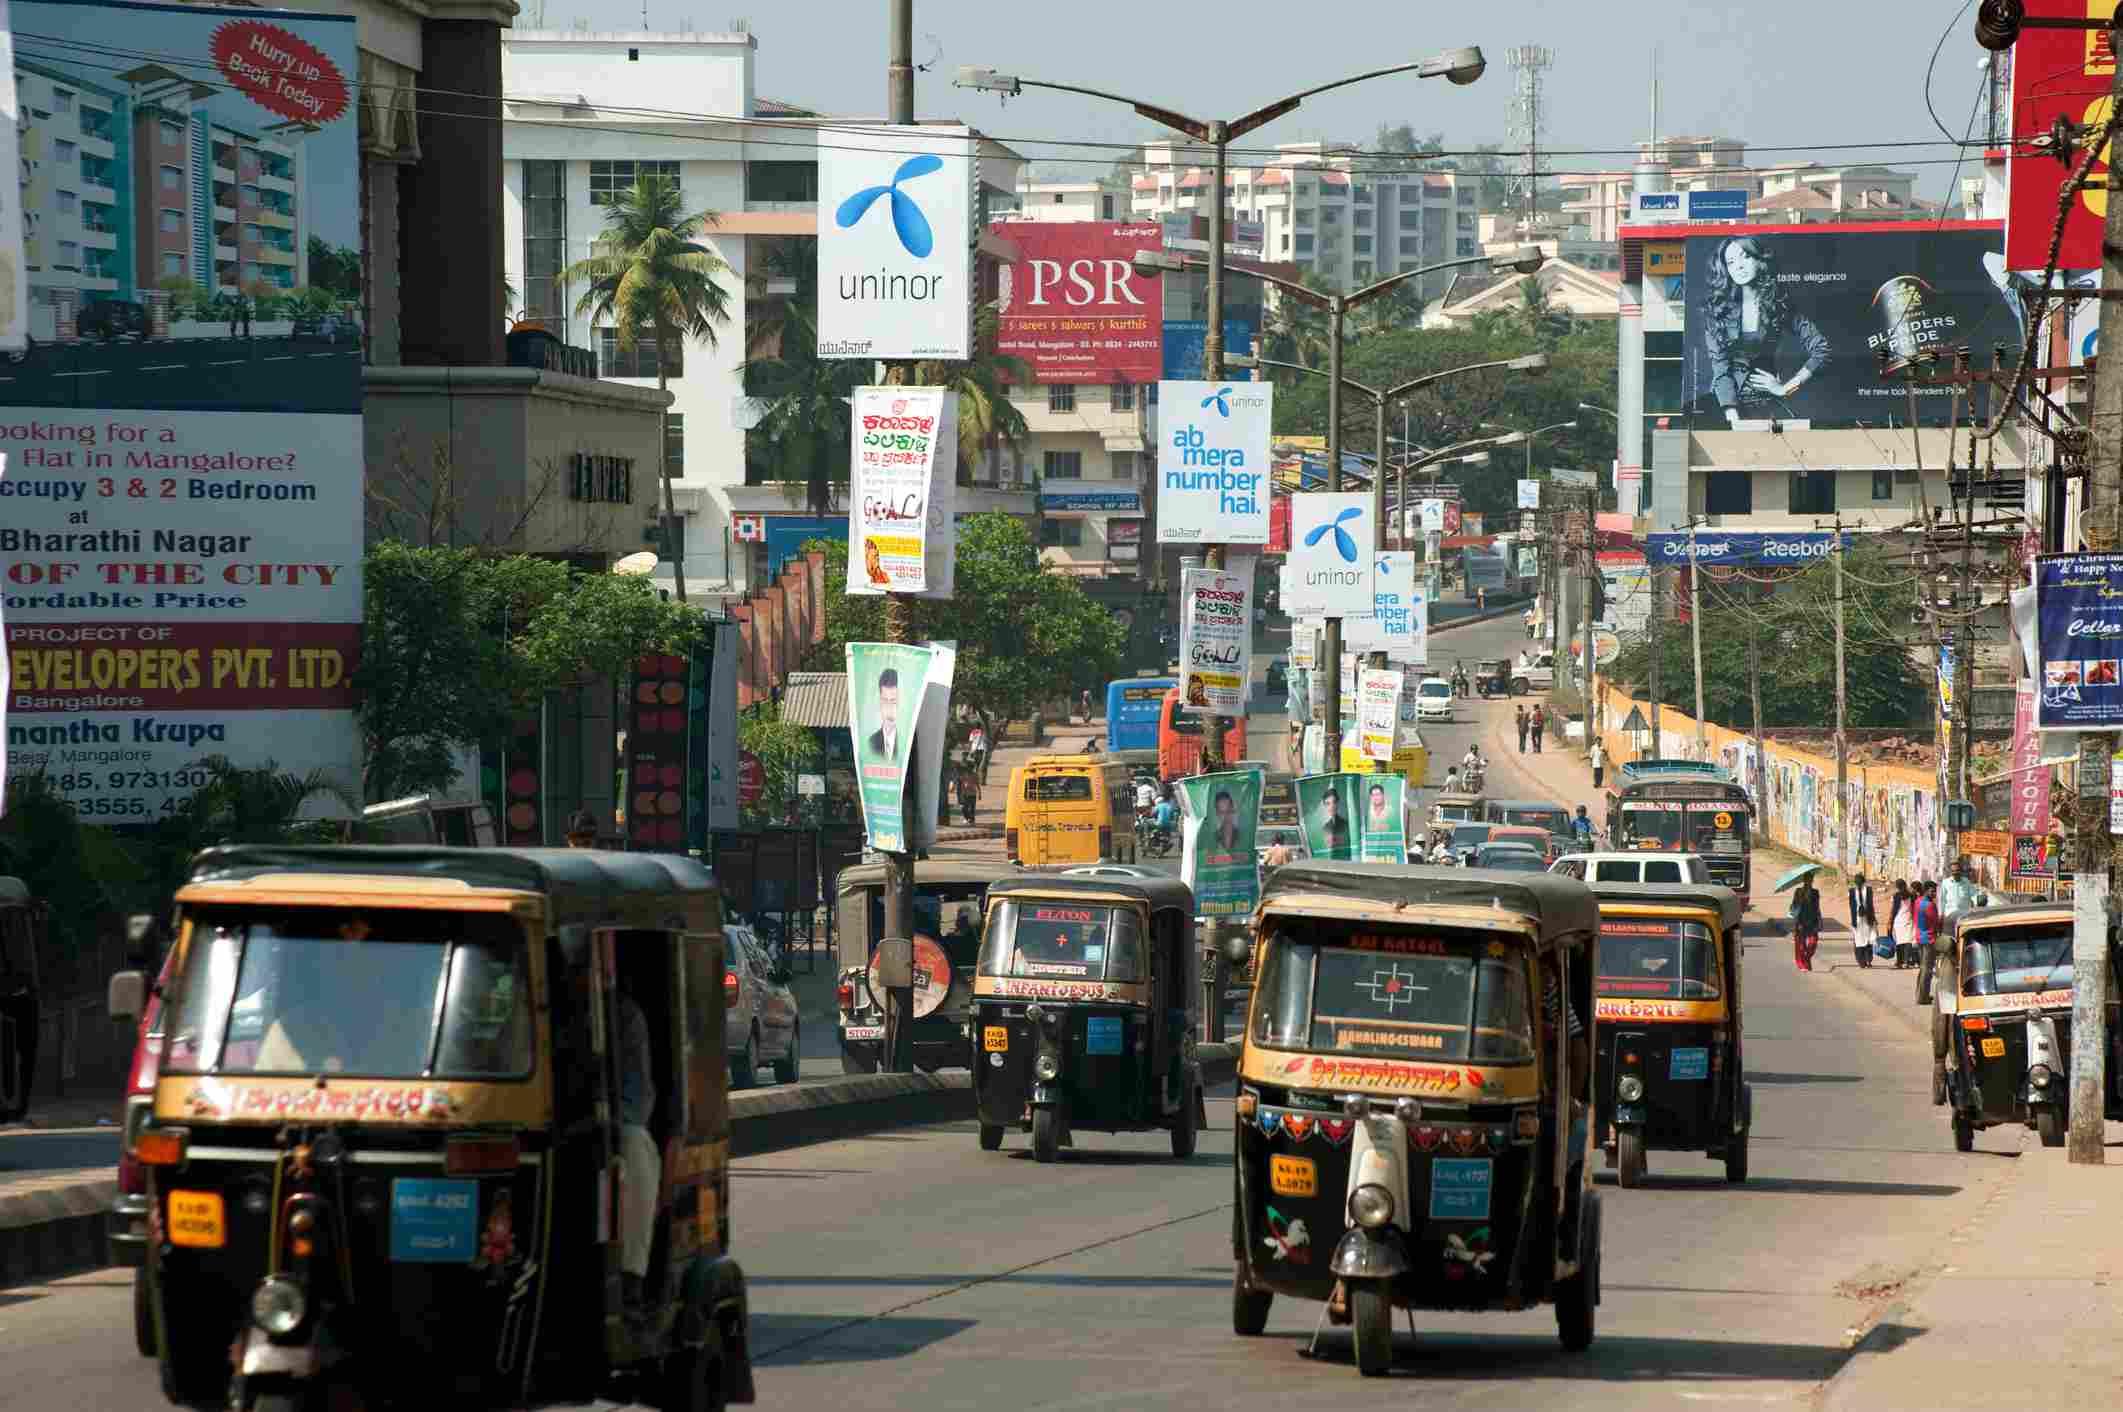 Traffic on m g road at, Mangalore, Karnataka, India